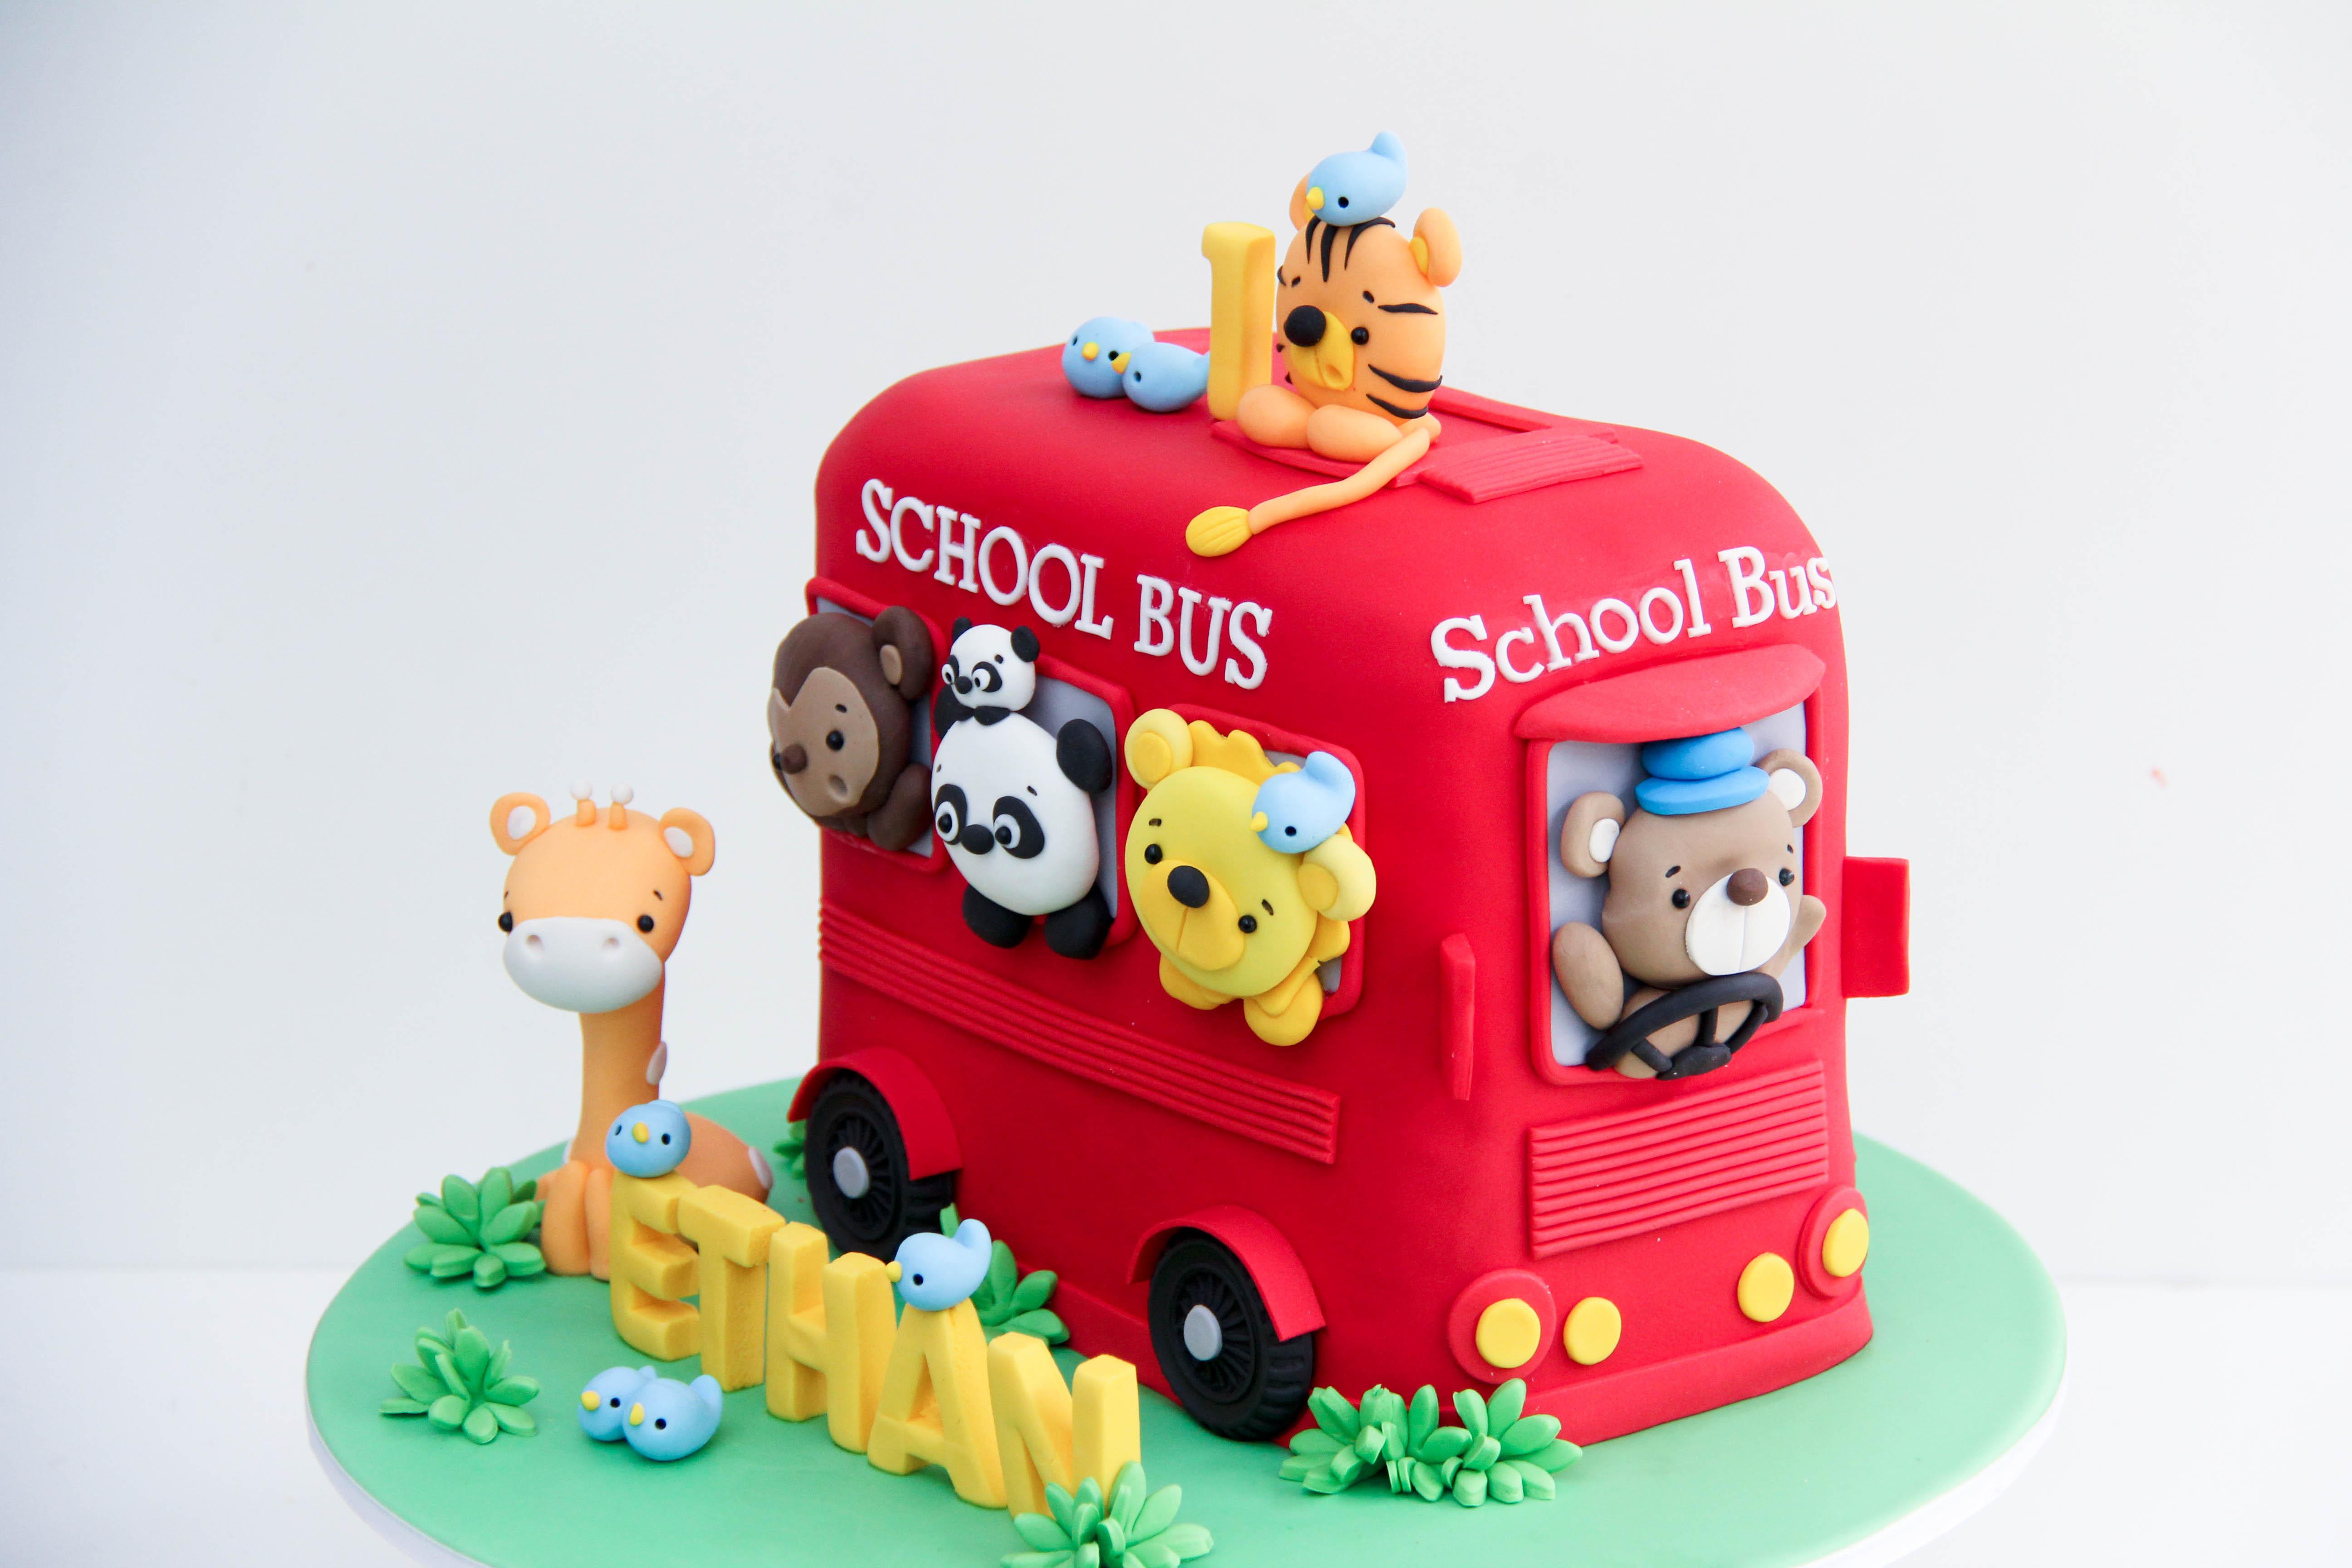 Animal school bus birthday cake